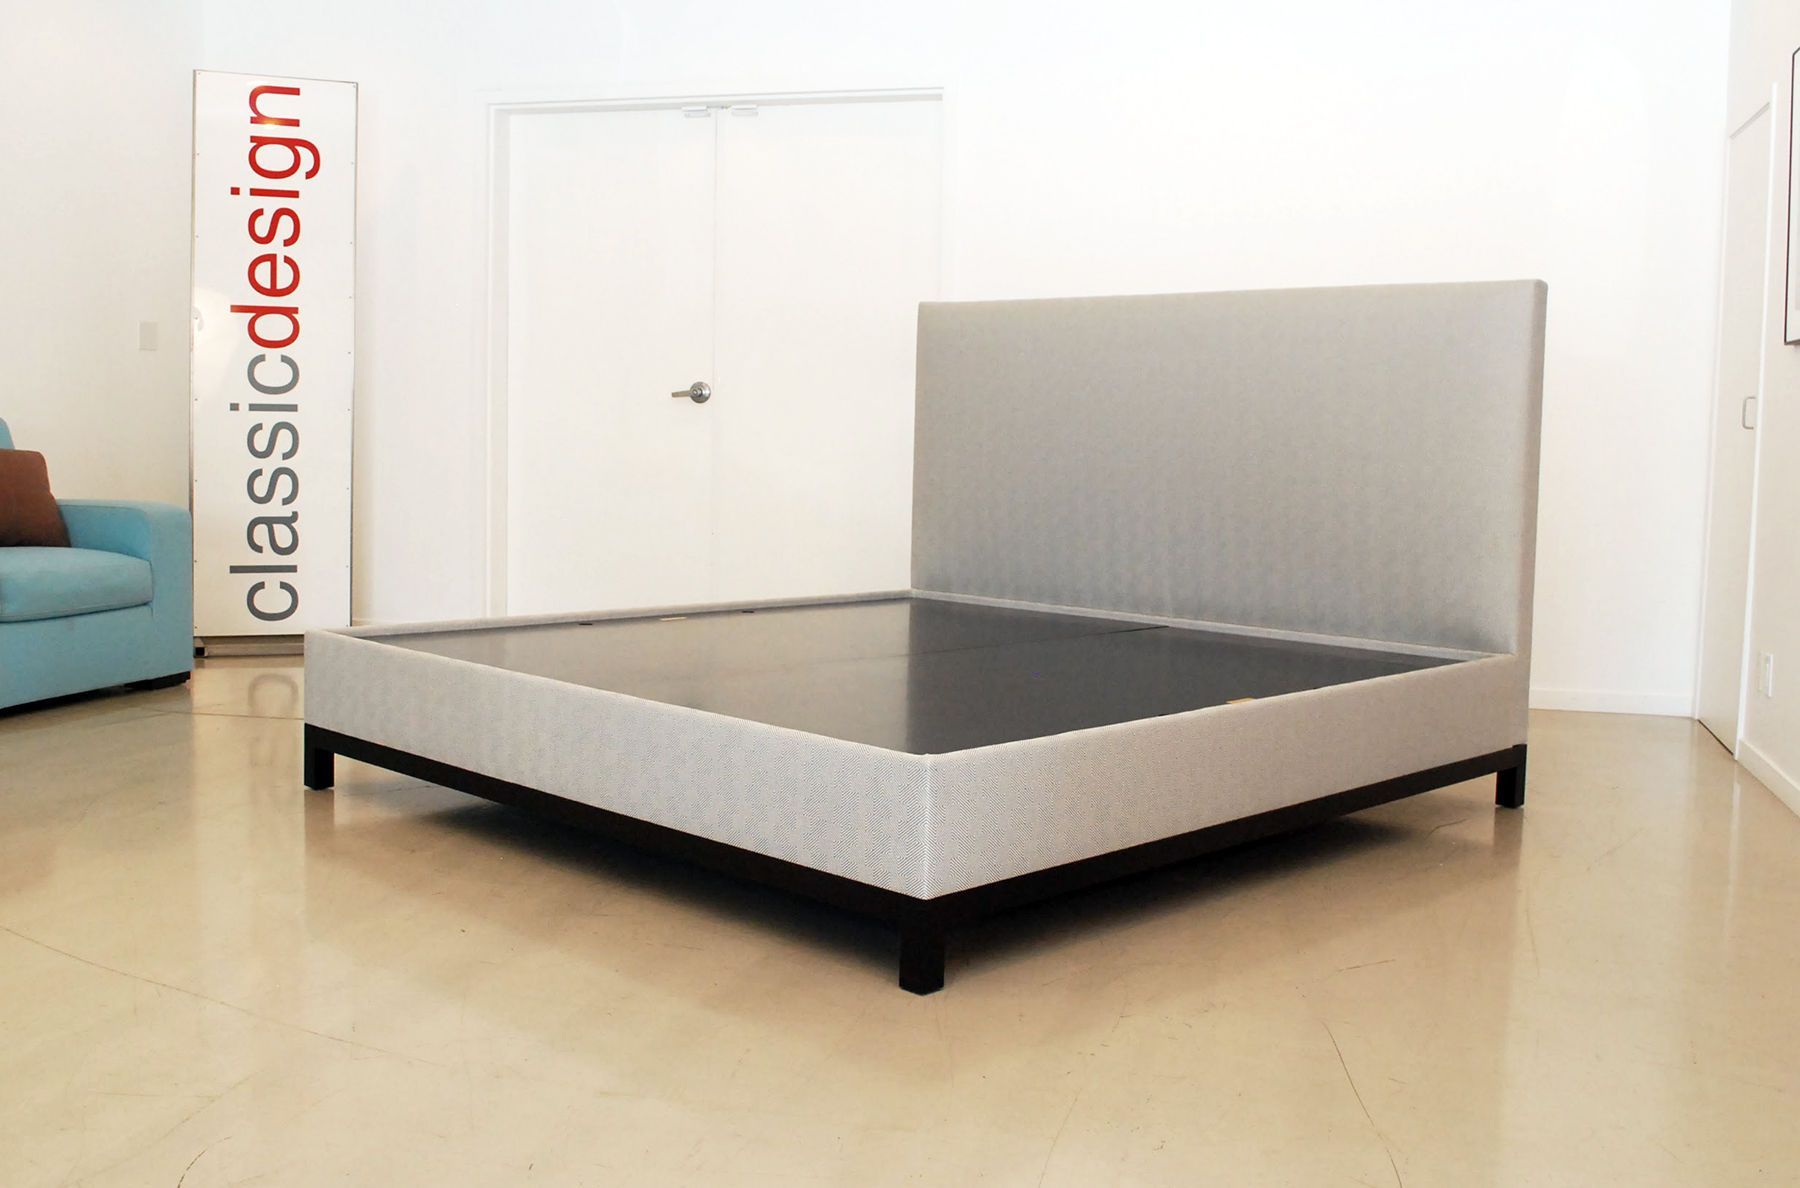 Classic Upholstered Headboard & Platform Base Bed